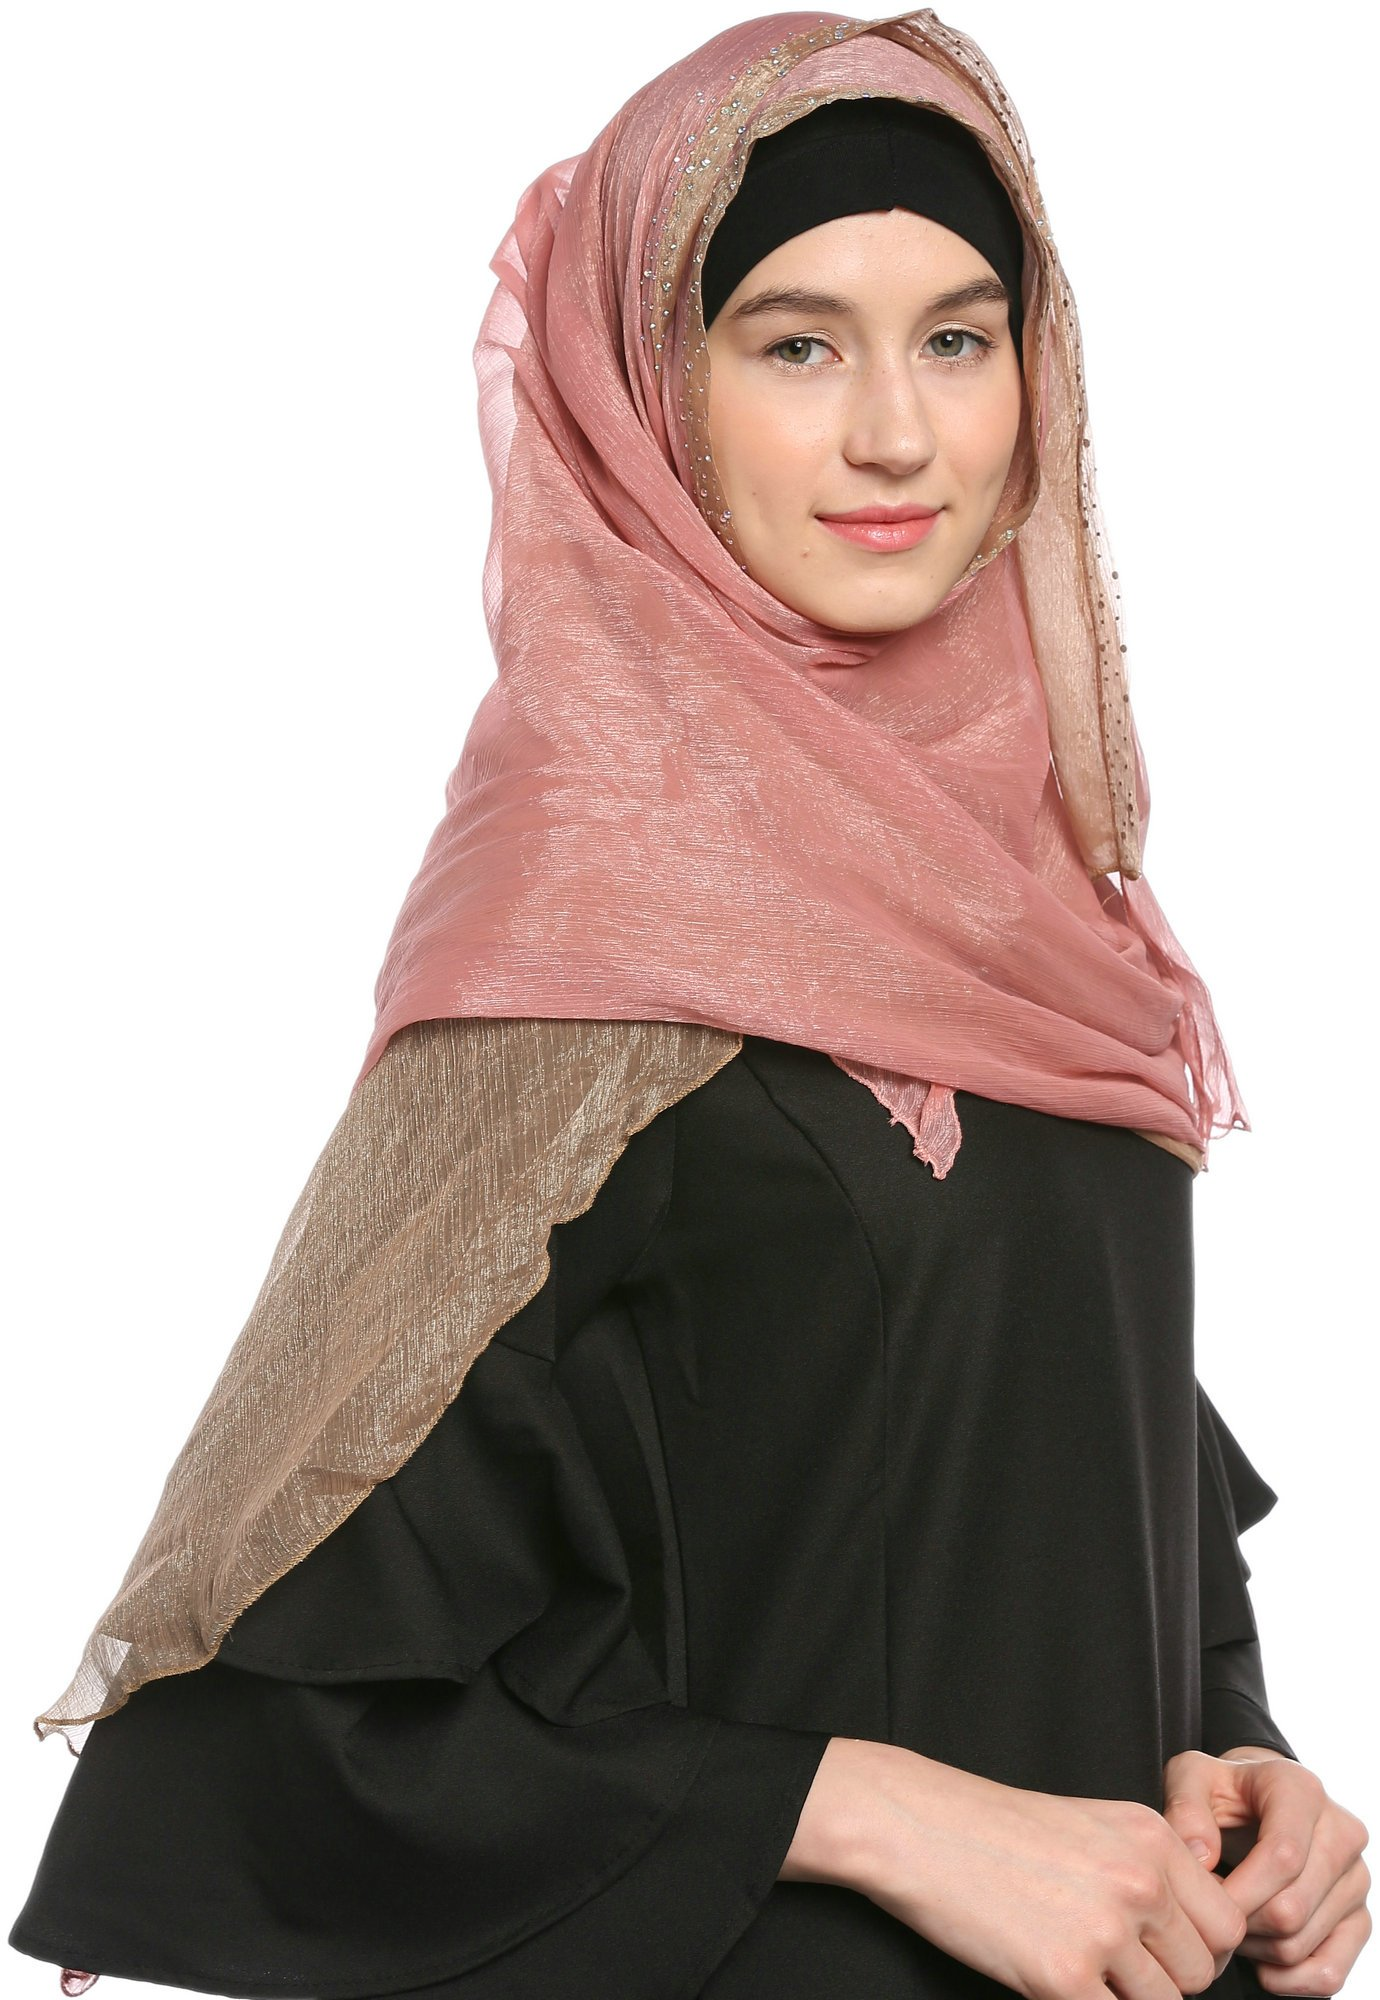 Ababalaya Lace Decorated Wedding Hijab Islamic Hijab,Color3 by Ababalaya (Image #5)